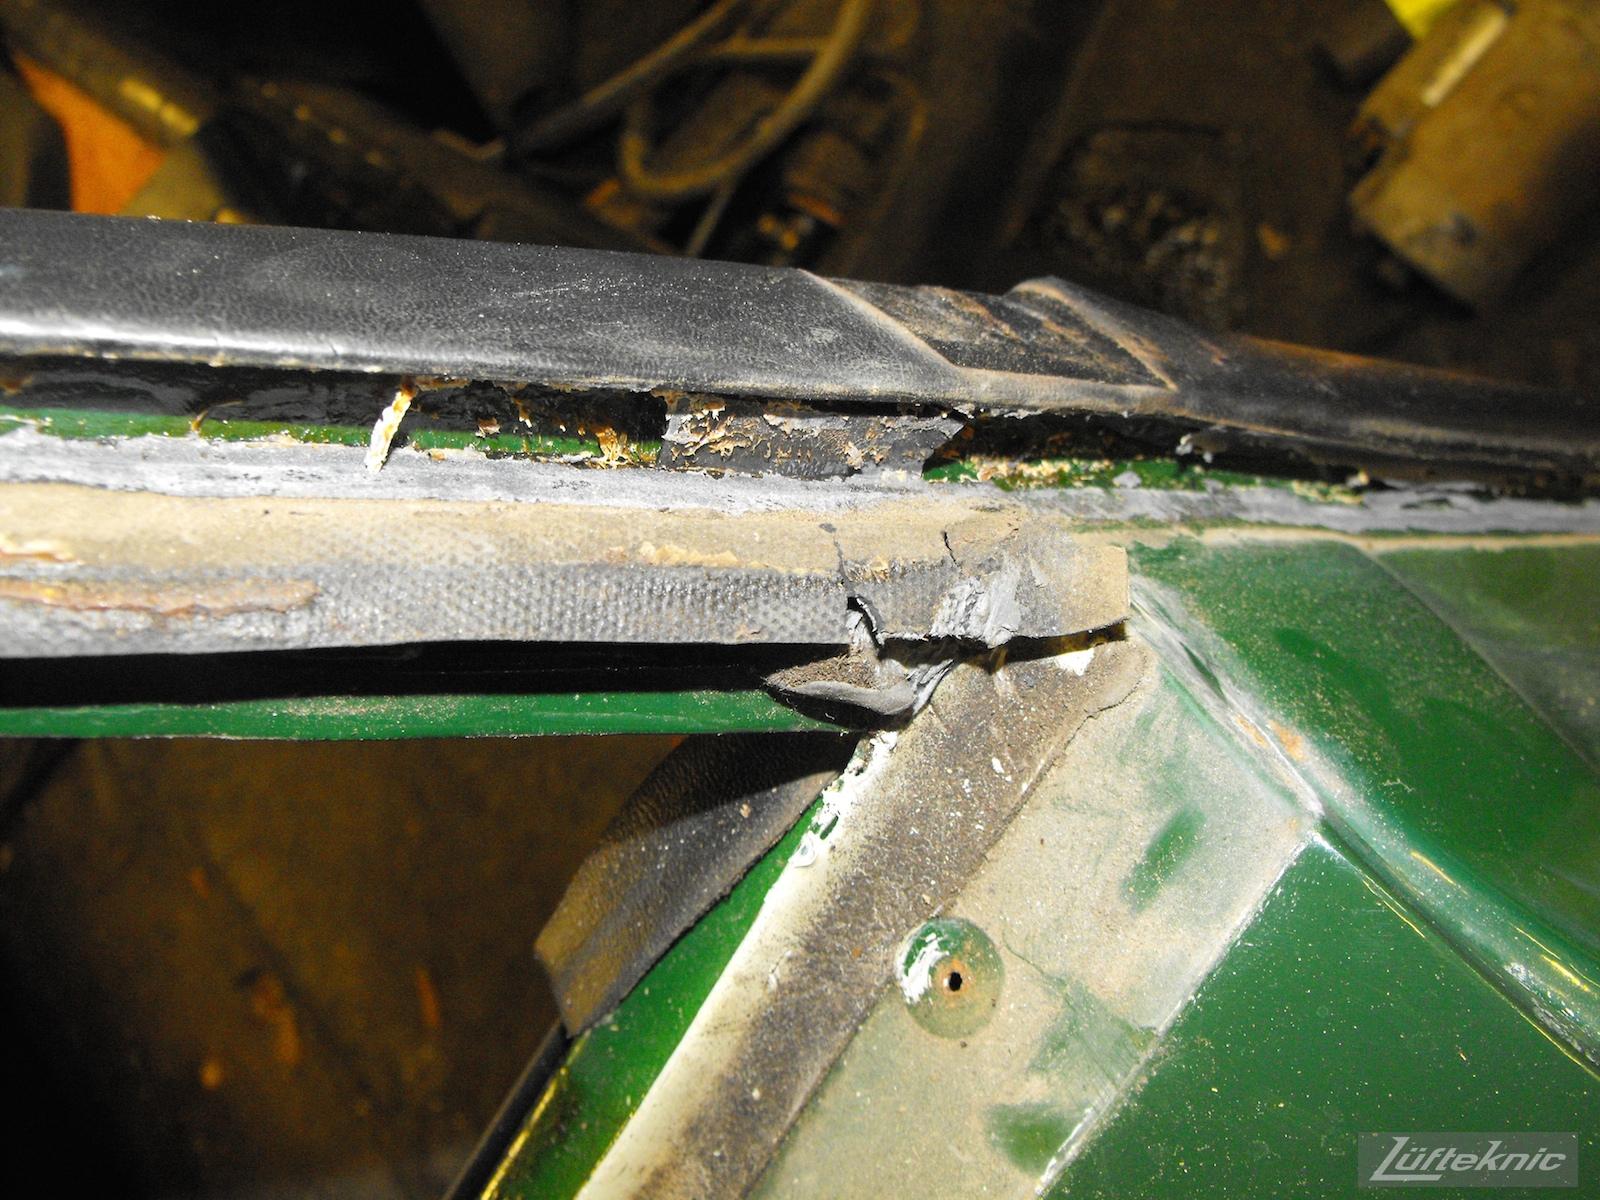 Aged parts and seals on an Irish Green Porsche 912 undergoing restoration at Lufteknic.